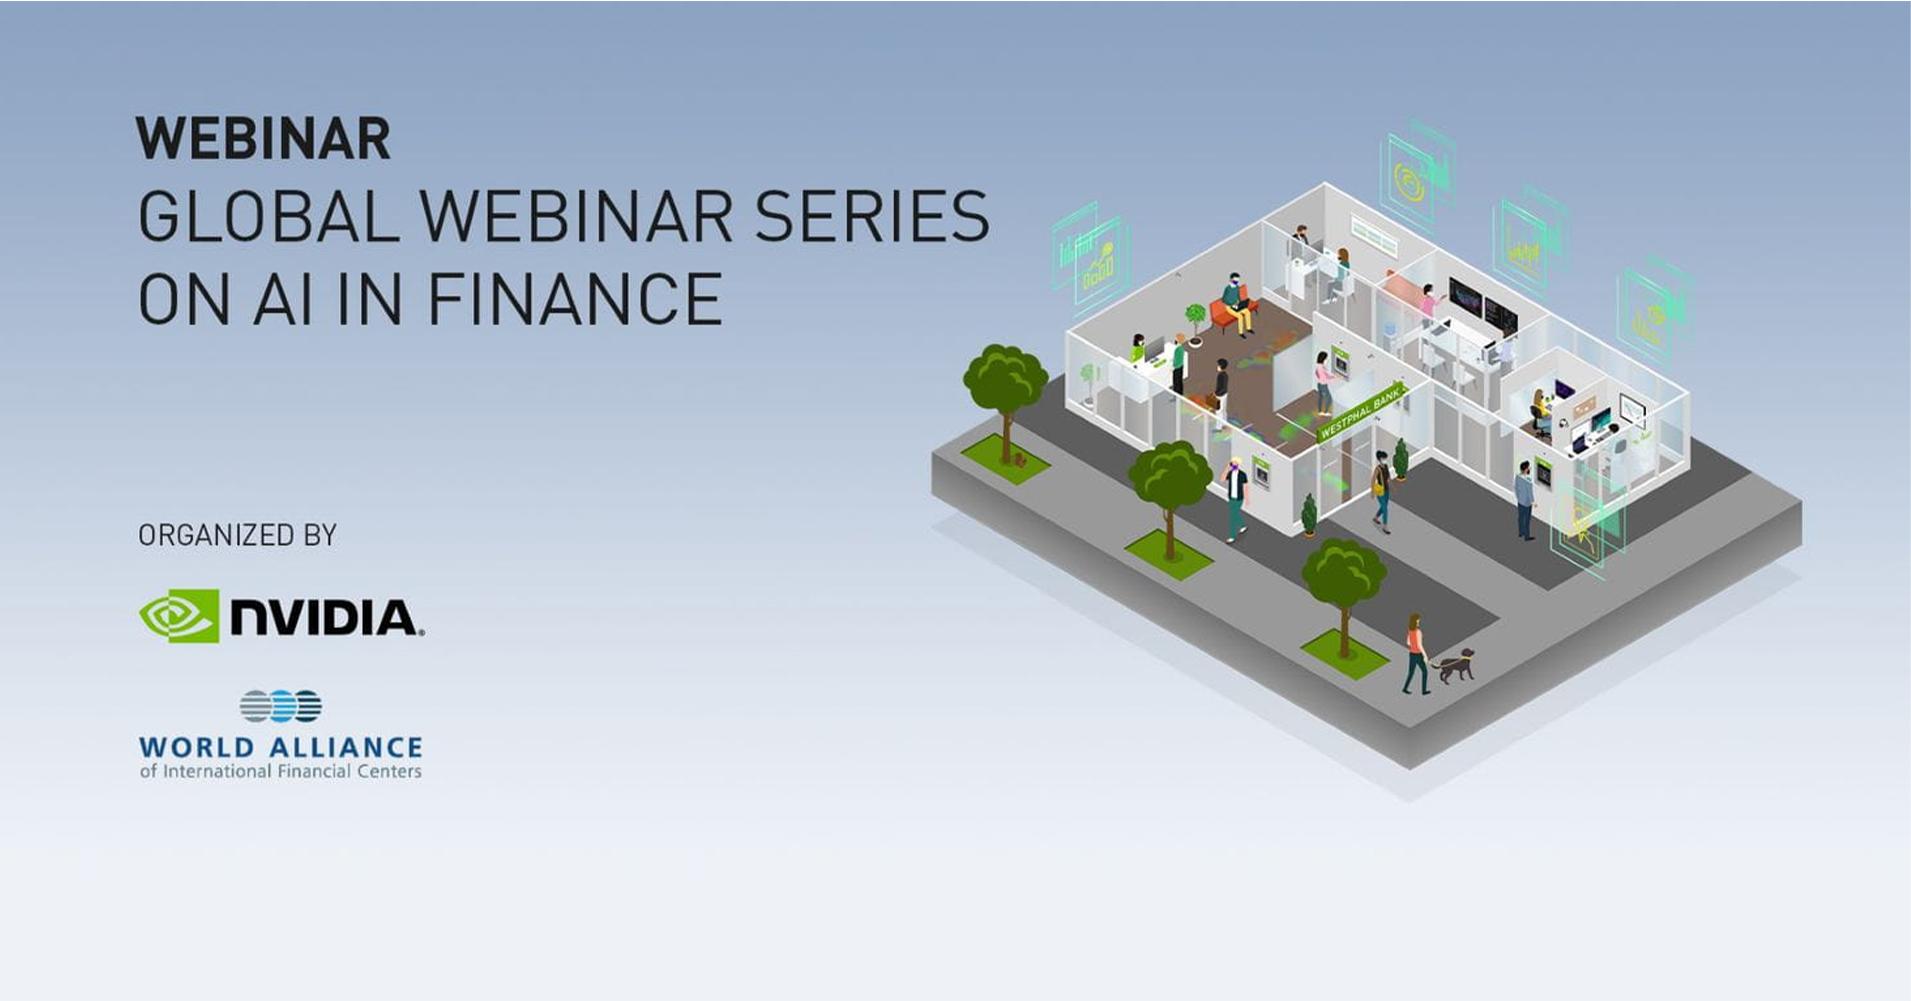 Global Webinar Series on Artificial Intelligence in Finance: Focus on Asia